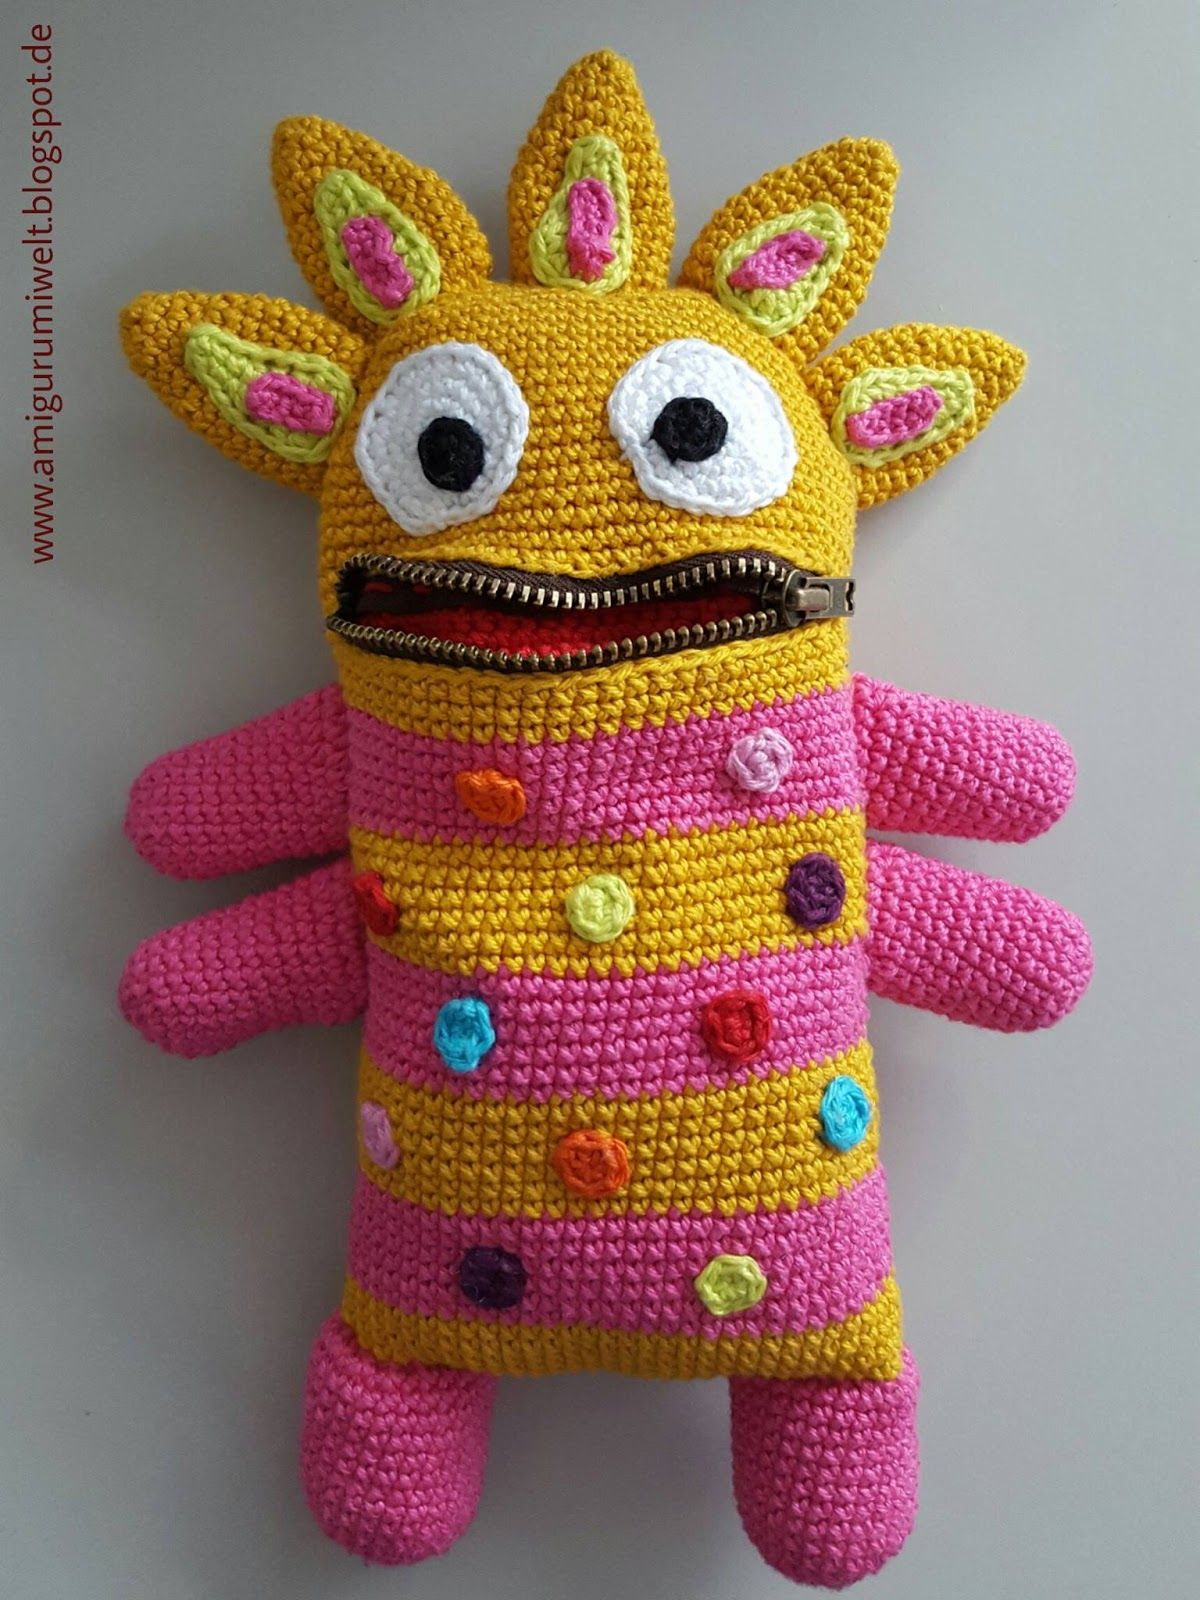 Amigurumi, häkeln, crochet, kostenlos, free, monster | Hracky ...